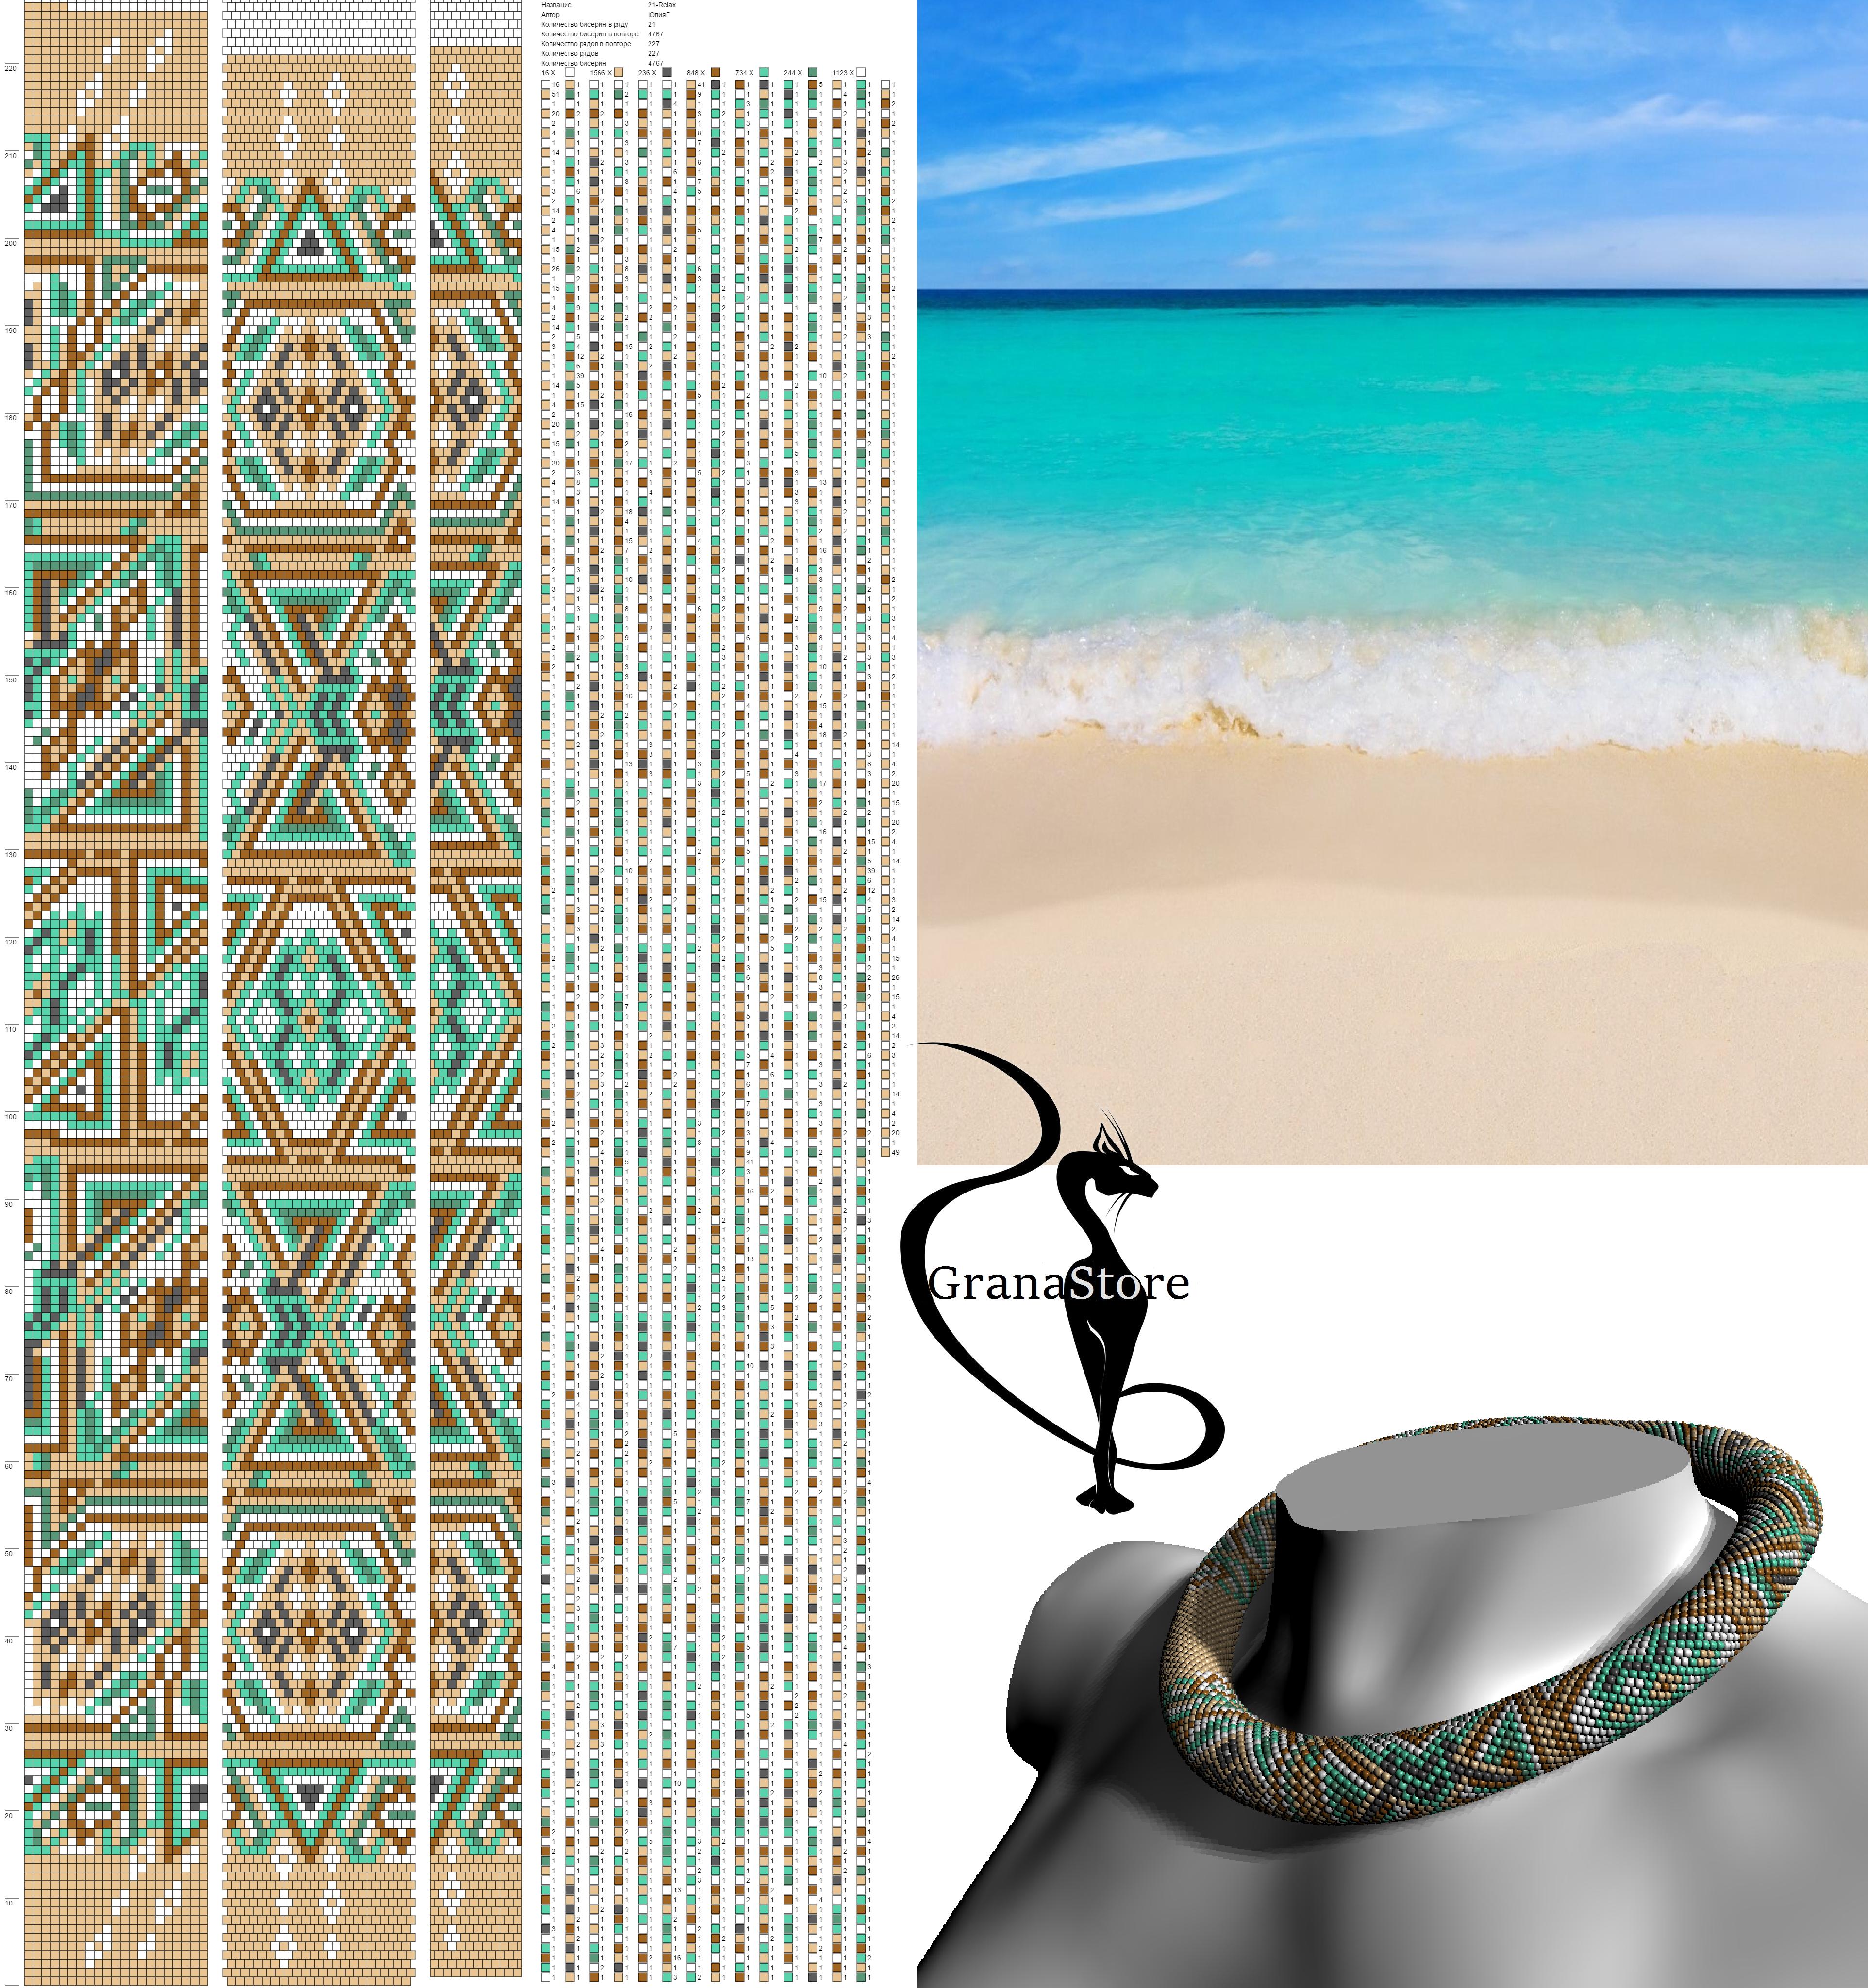 Pin de Jola Kamieńska en Bead crochet | Pinterest | Tríptico ...